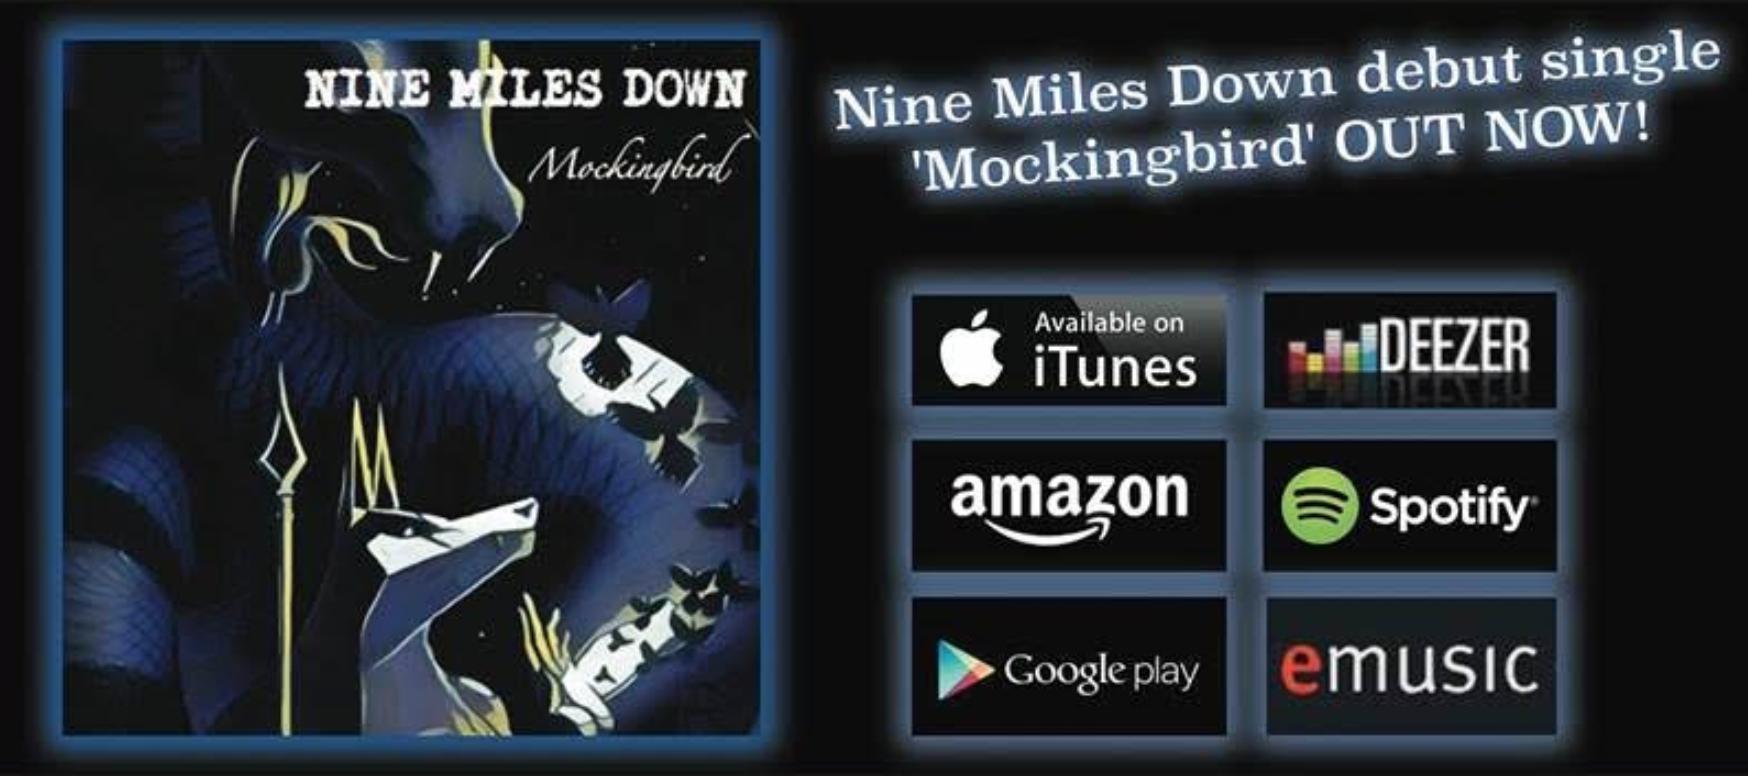 Nine Miles Down Mockingbird Debut Single Out Now!